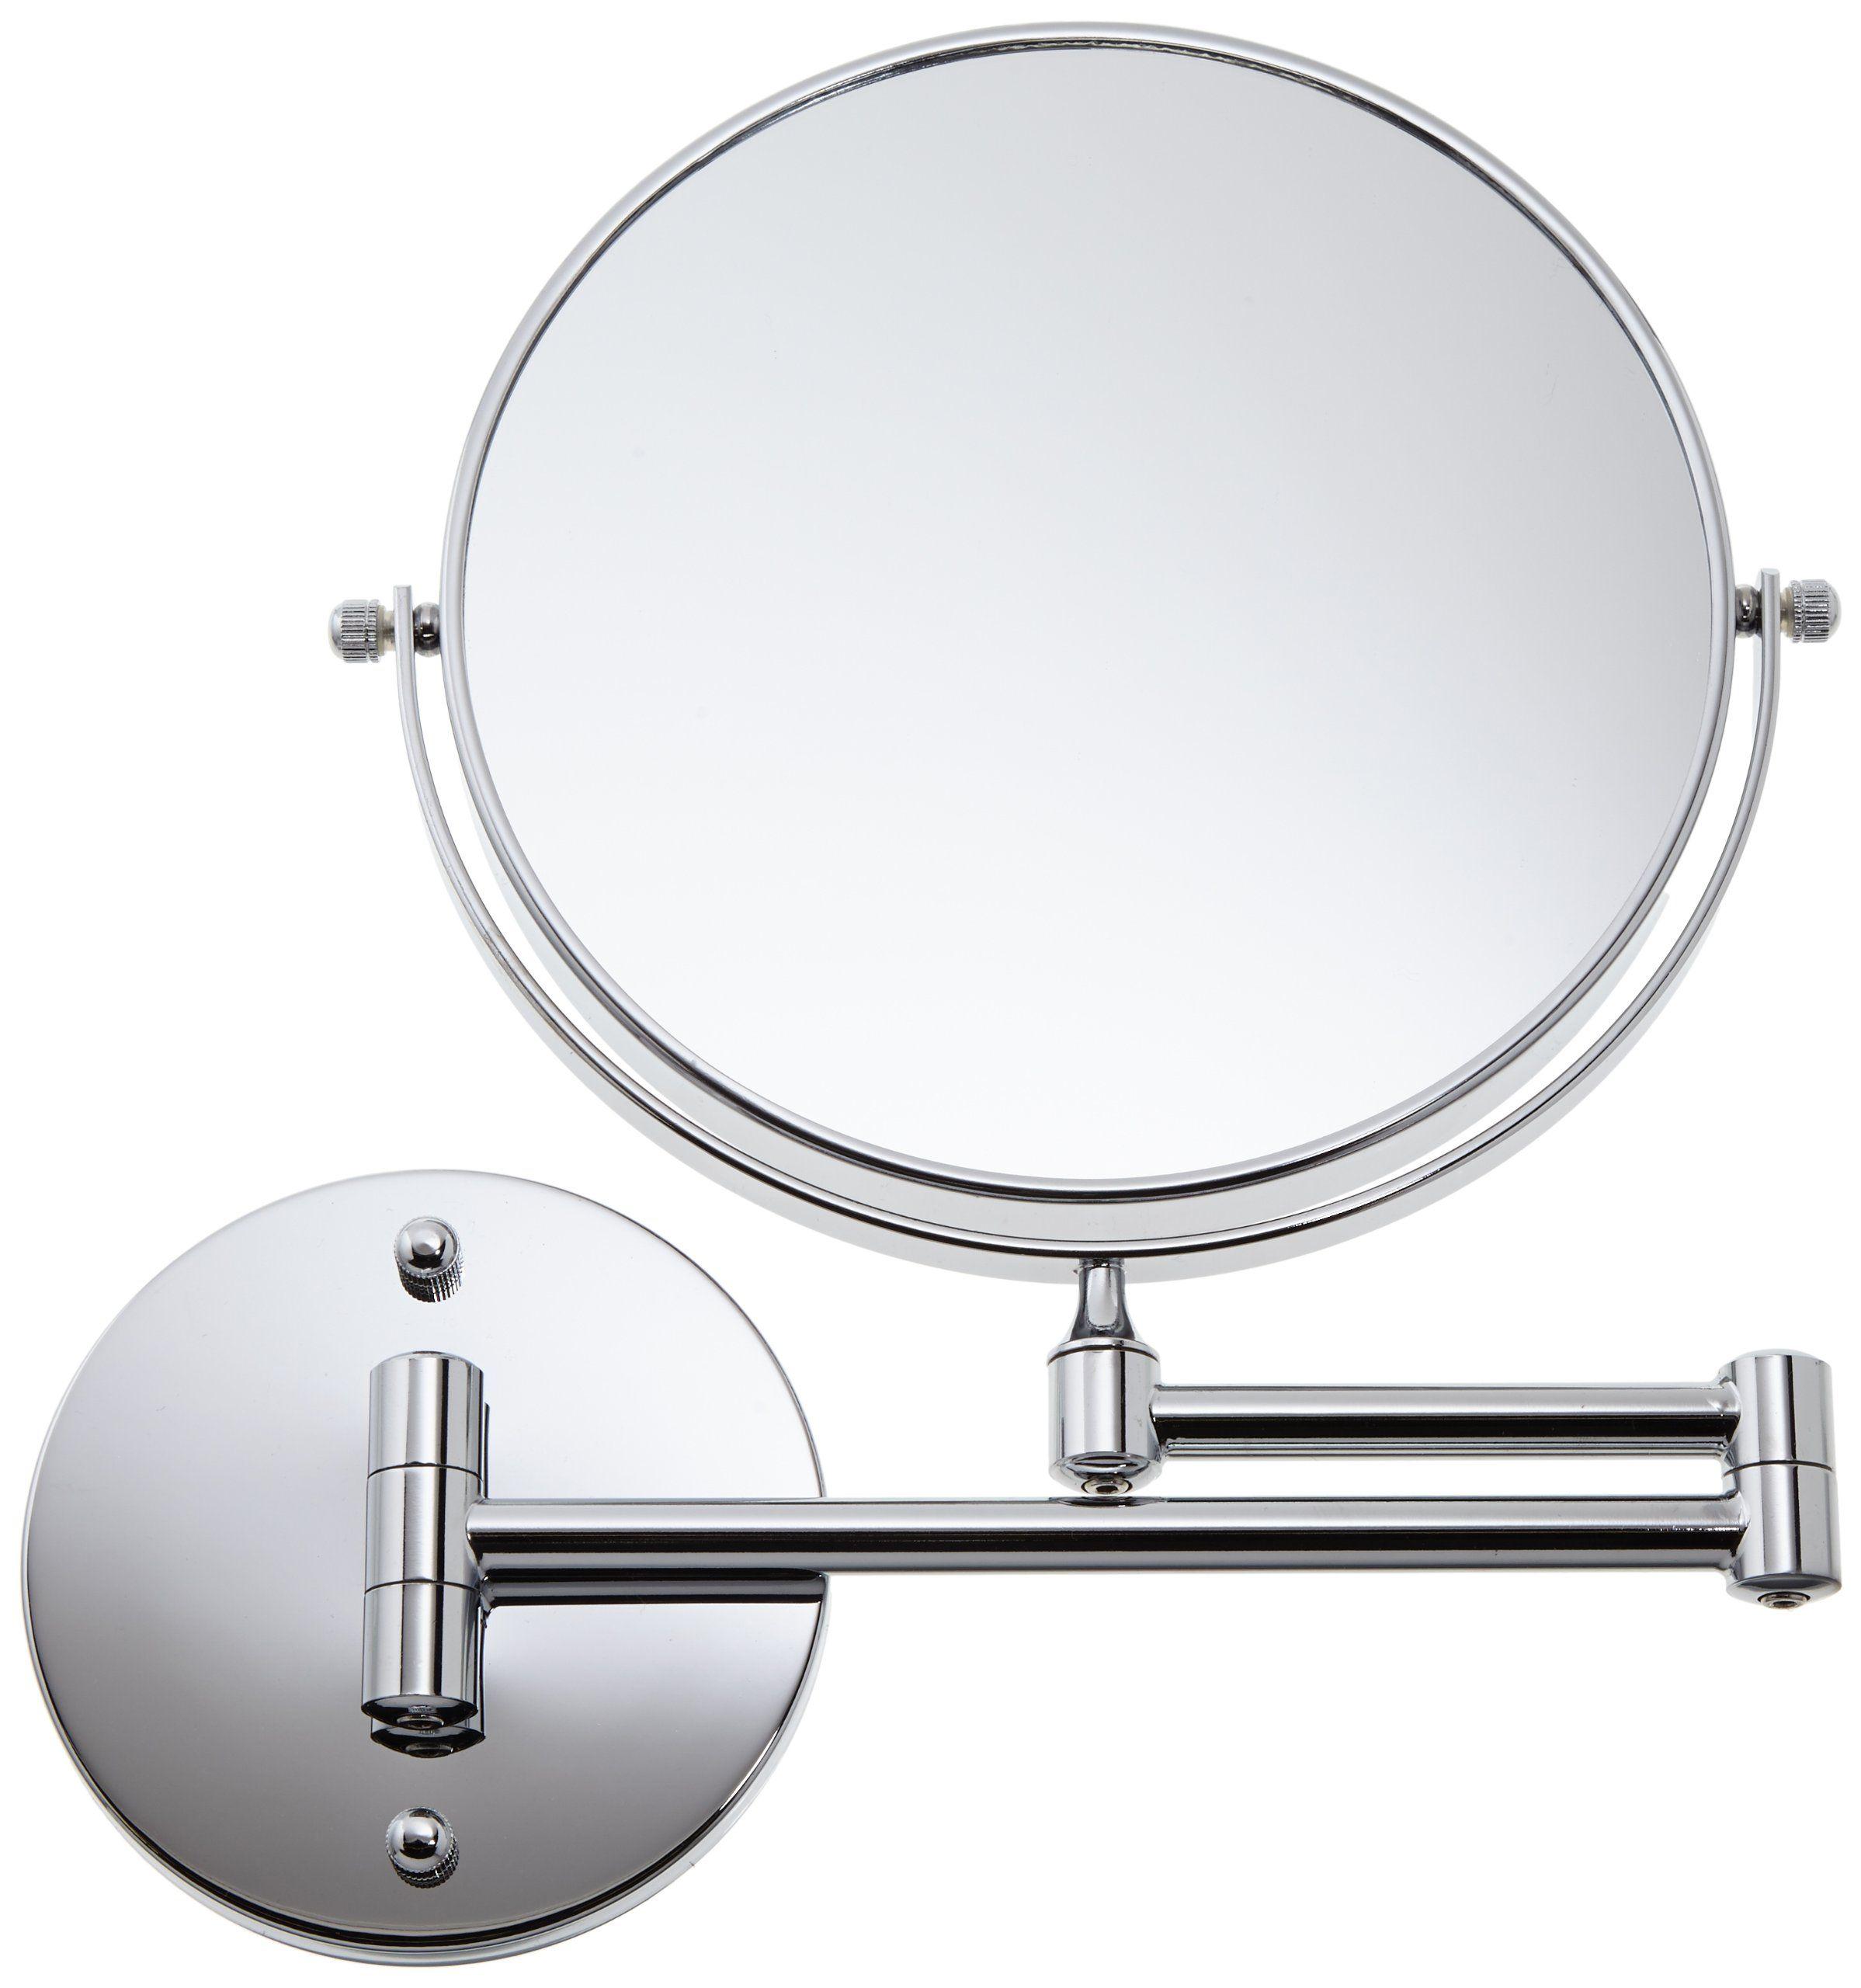 Loywe Wunderschone Kosmetikspiegel Normal 7fach Lw32 Amazon De Kuche Haushalt Kosmetikspiegel Spiegel Schminkspiegel